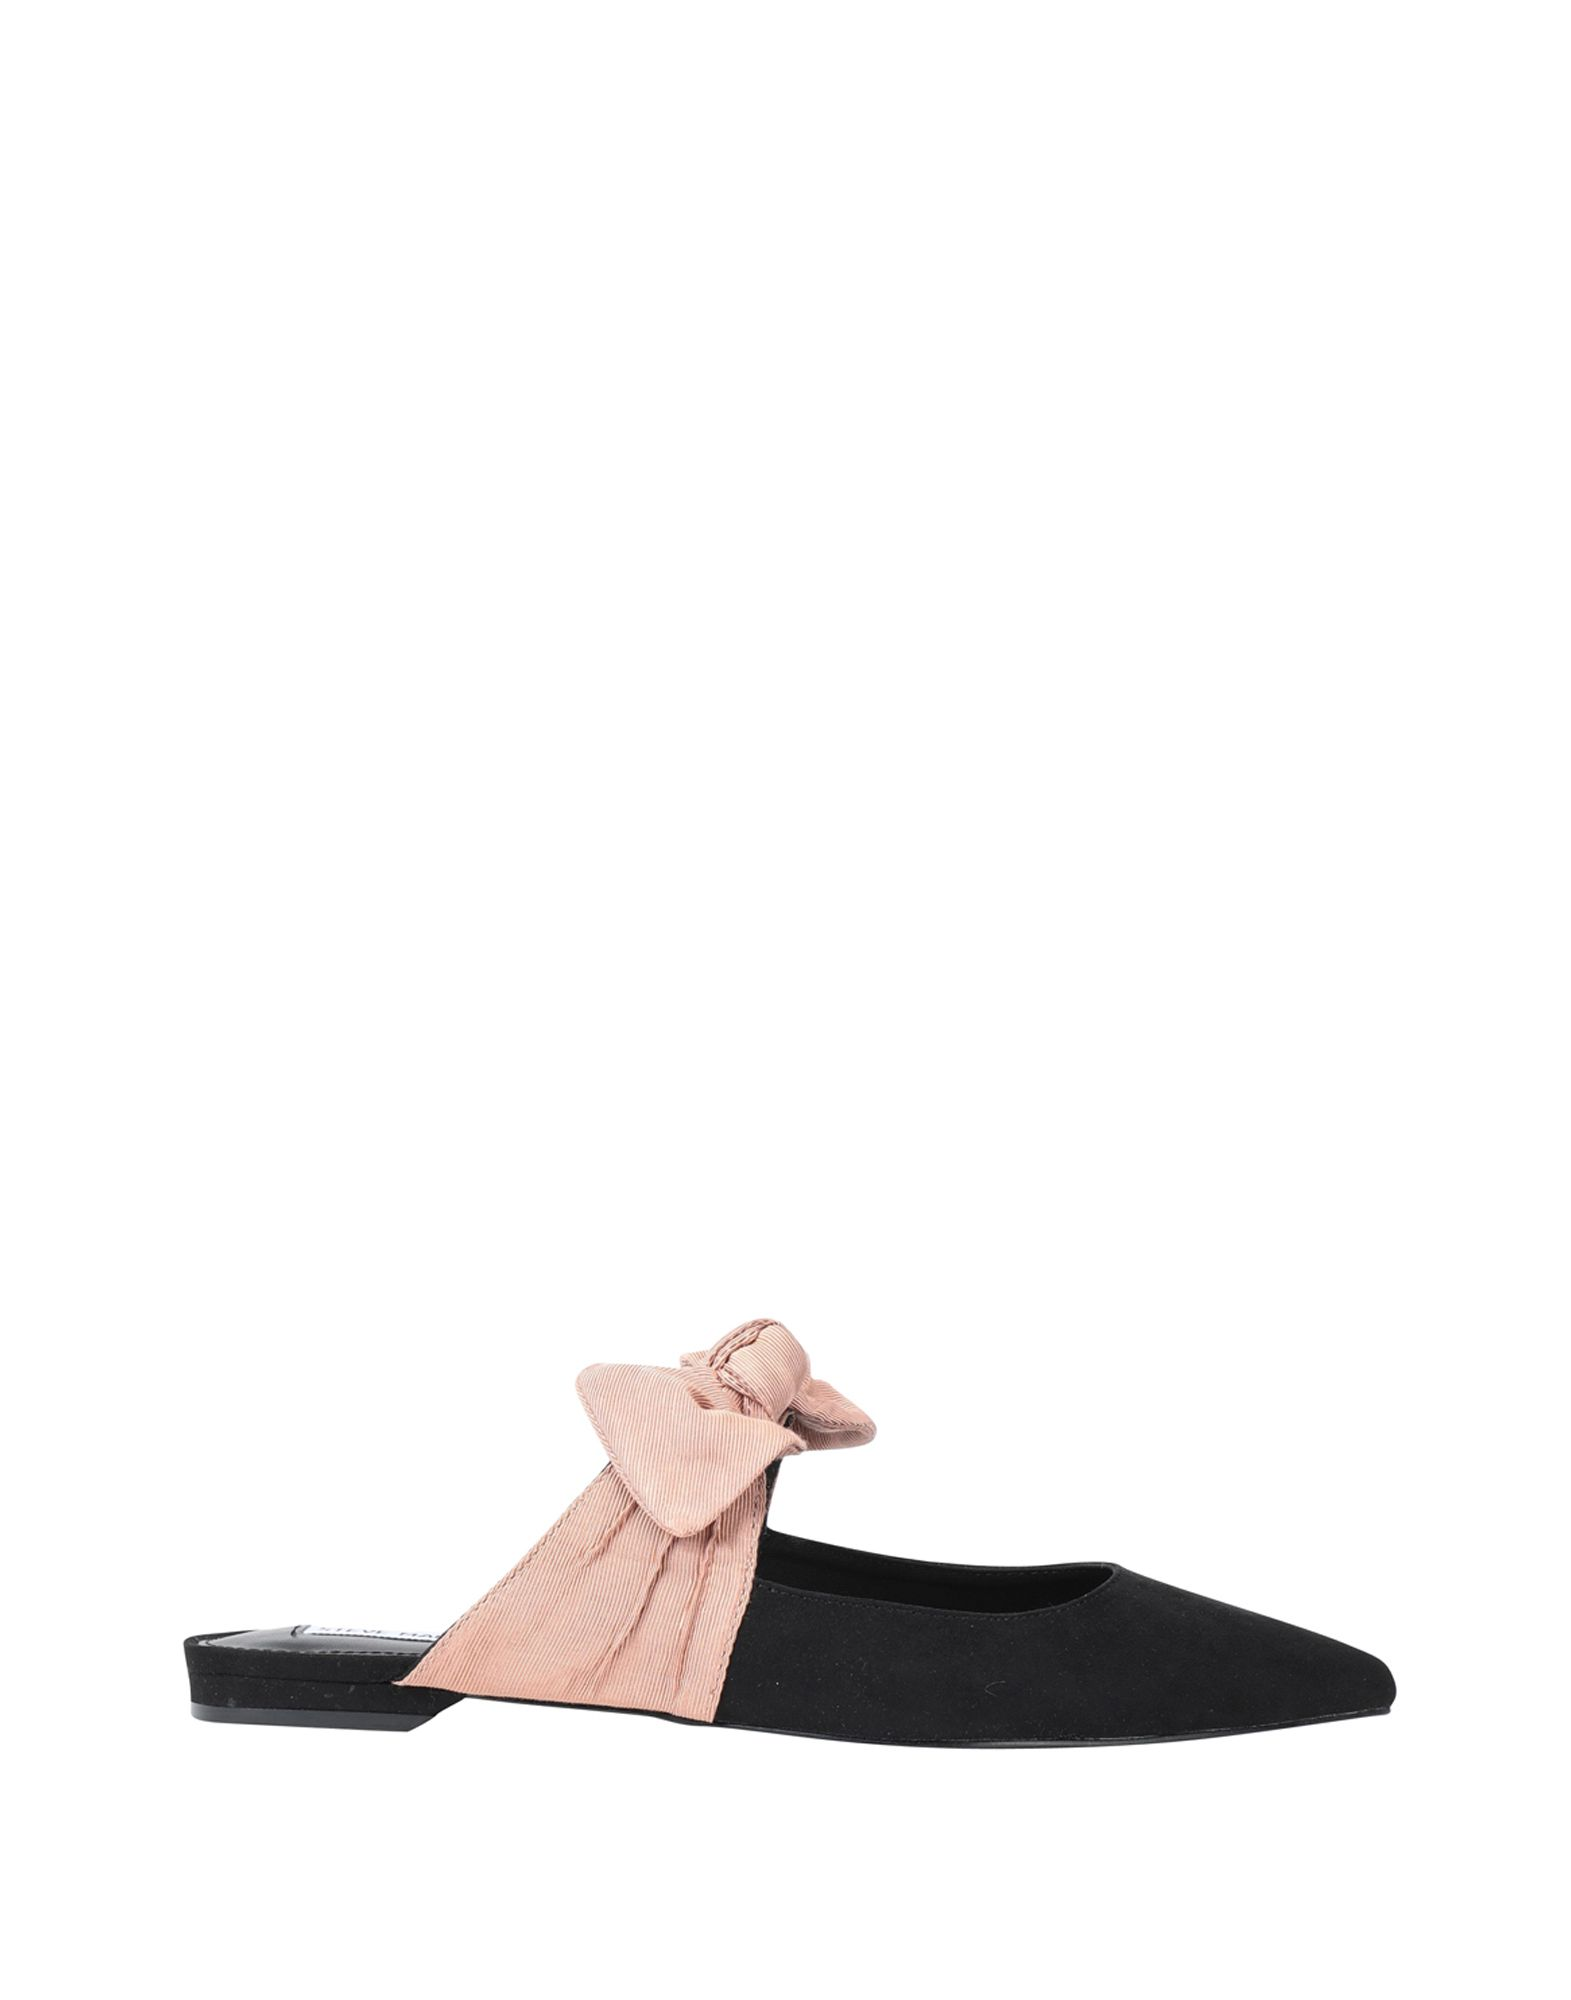 Stivaletti Carmens Donna - scarpe 11201958HR Nuove offerte e scarpe - comode e7abdb